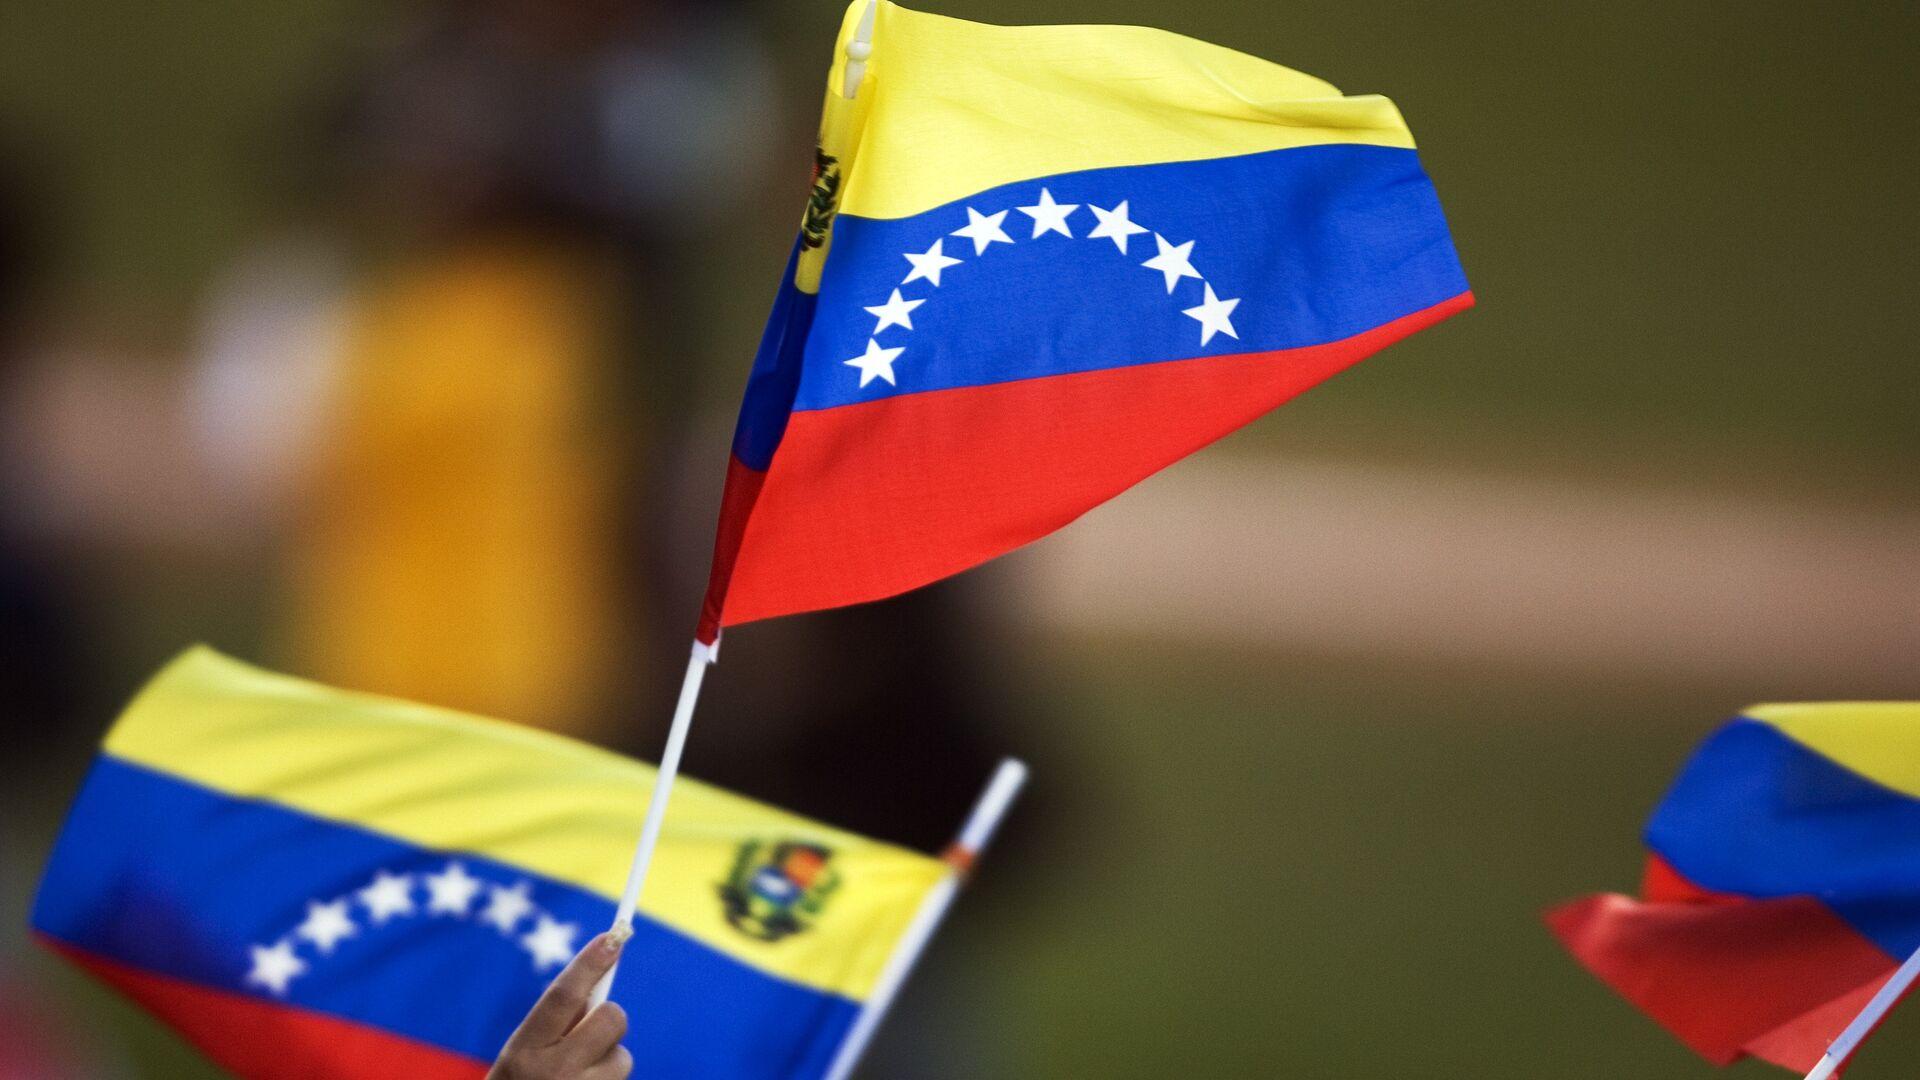 Banderas de Venezuela - Sputnik Mundo, 1920, 07.09.2021